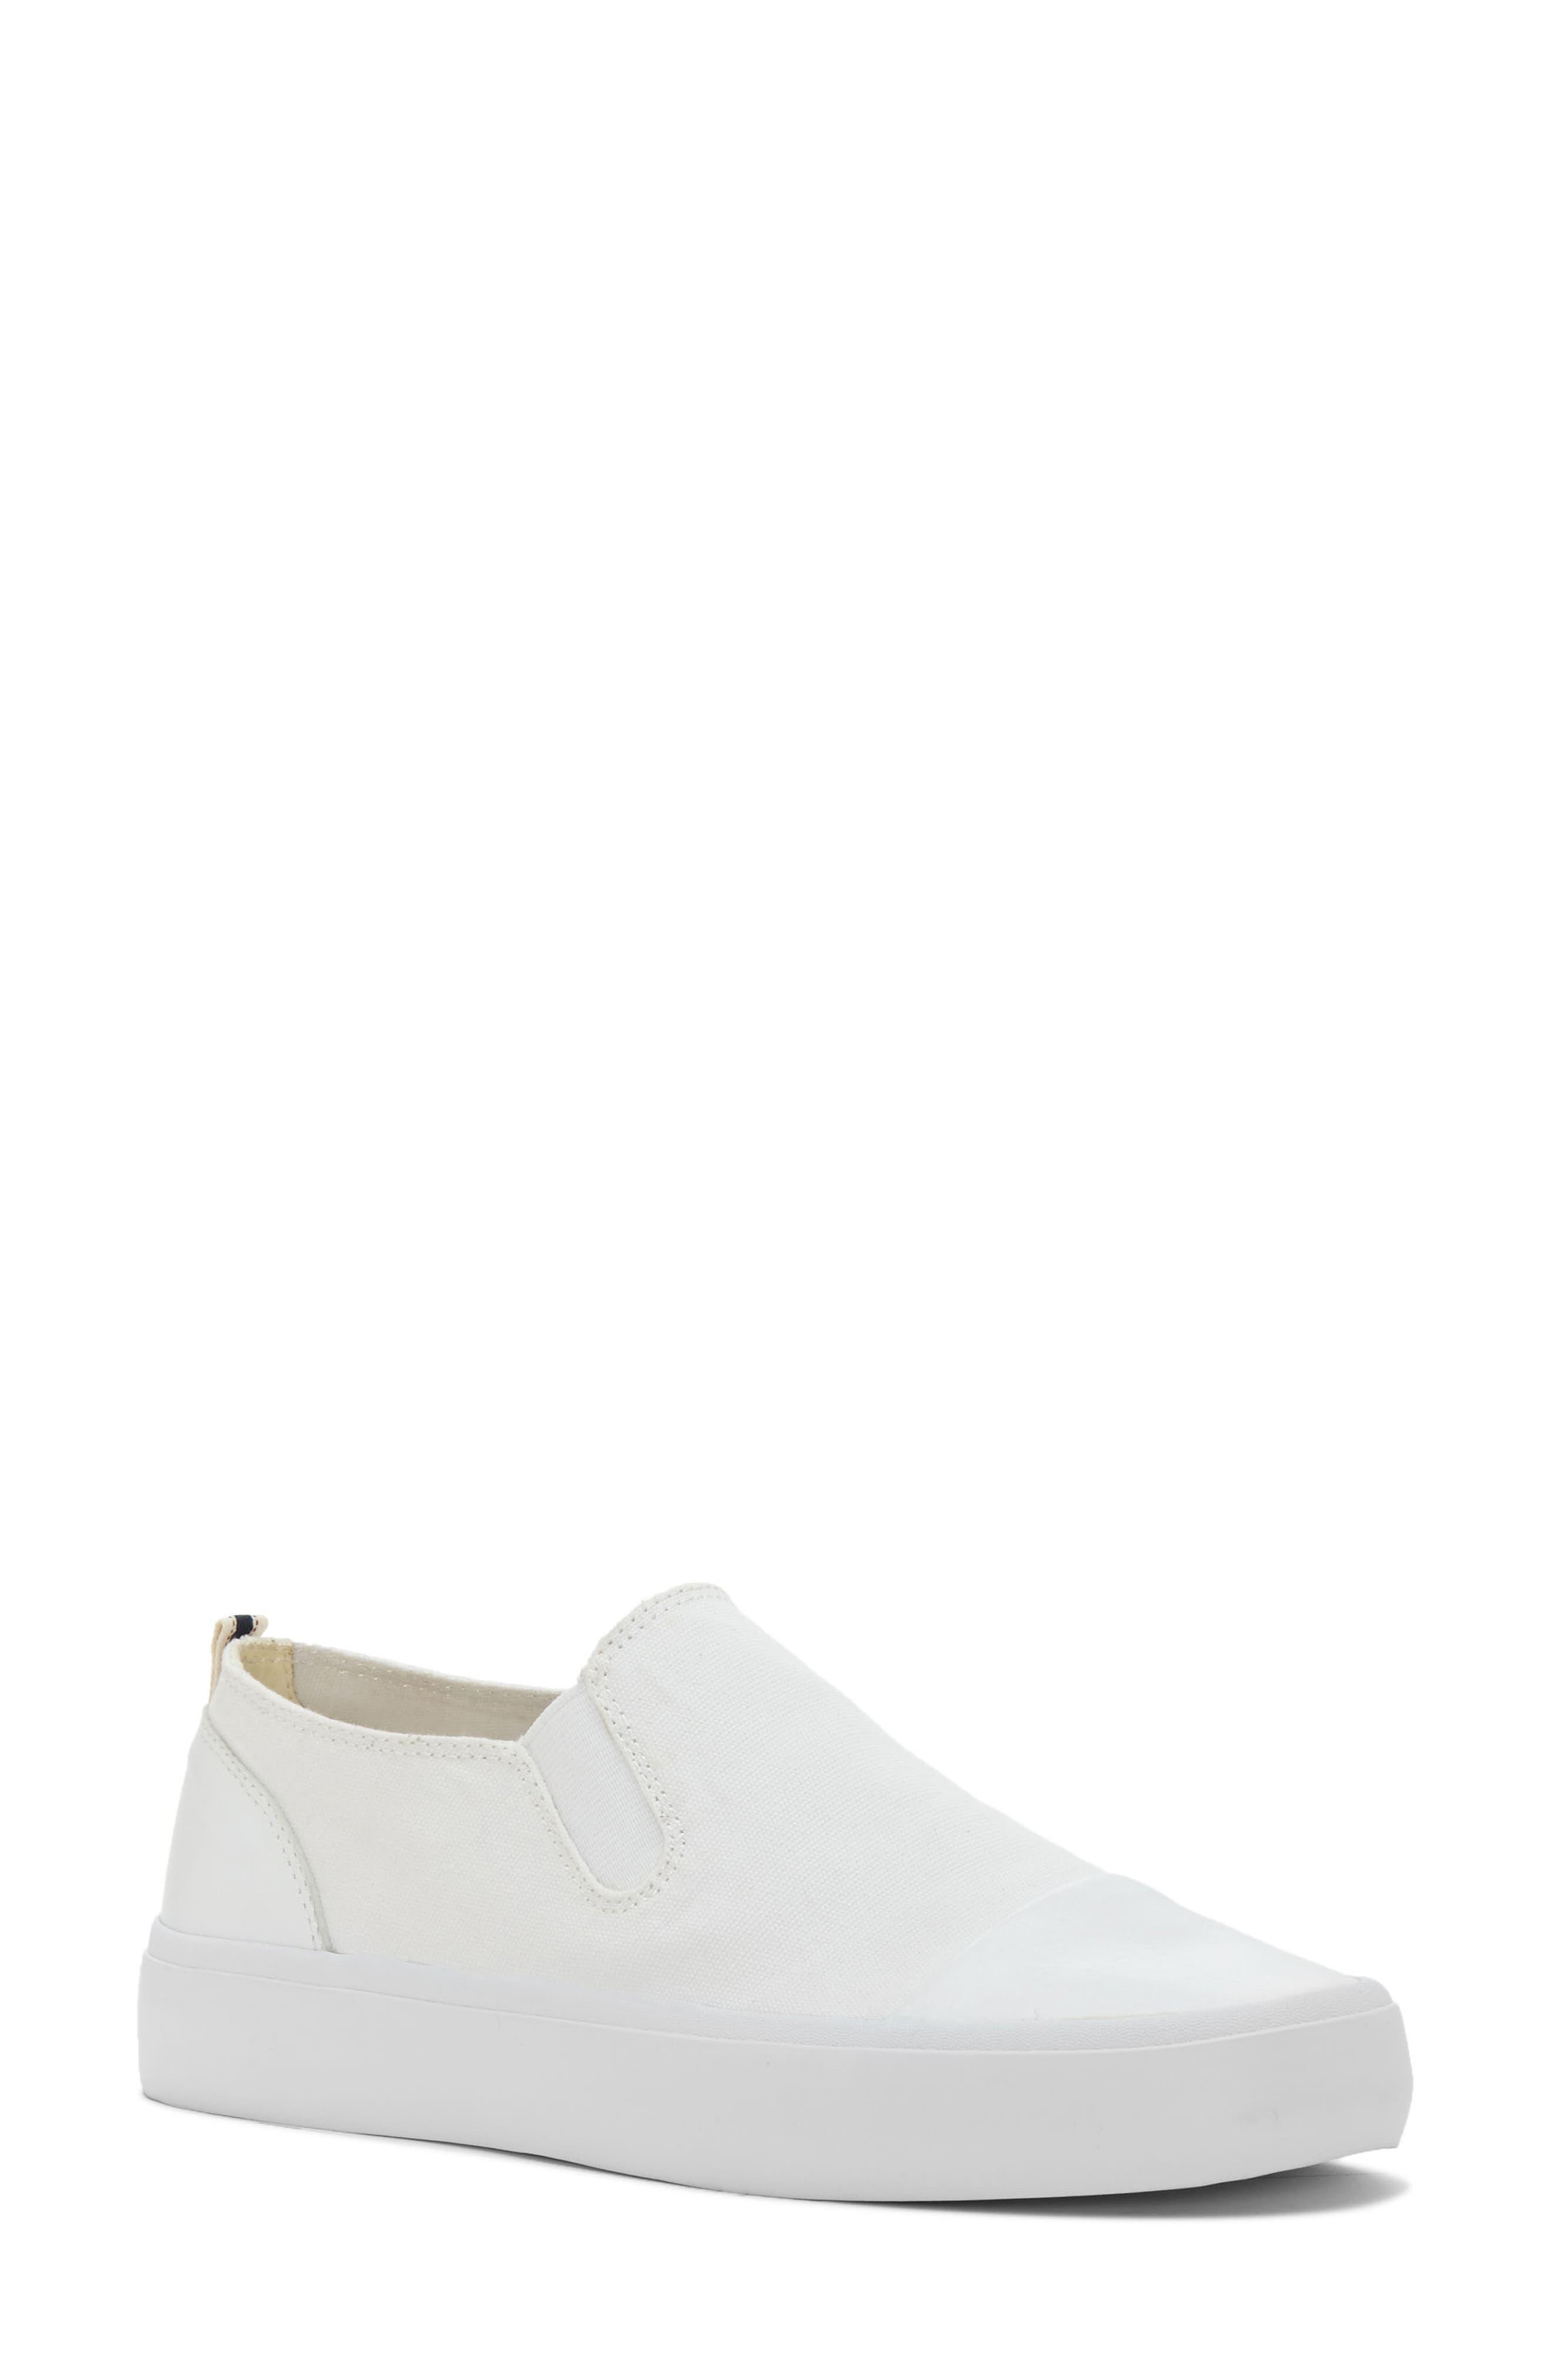 Darja Slip-On Sneaker,                             Main thumbnail 1, color,                             Pure White Fabric